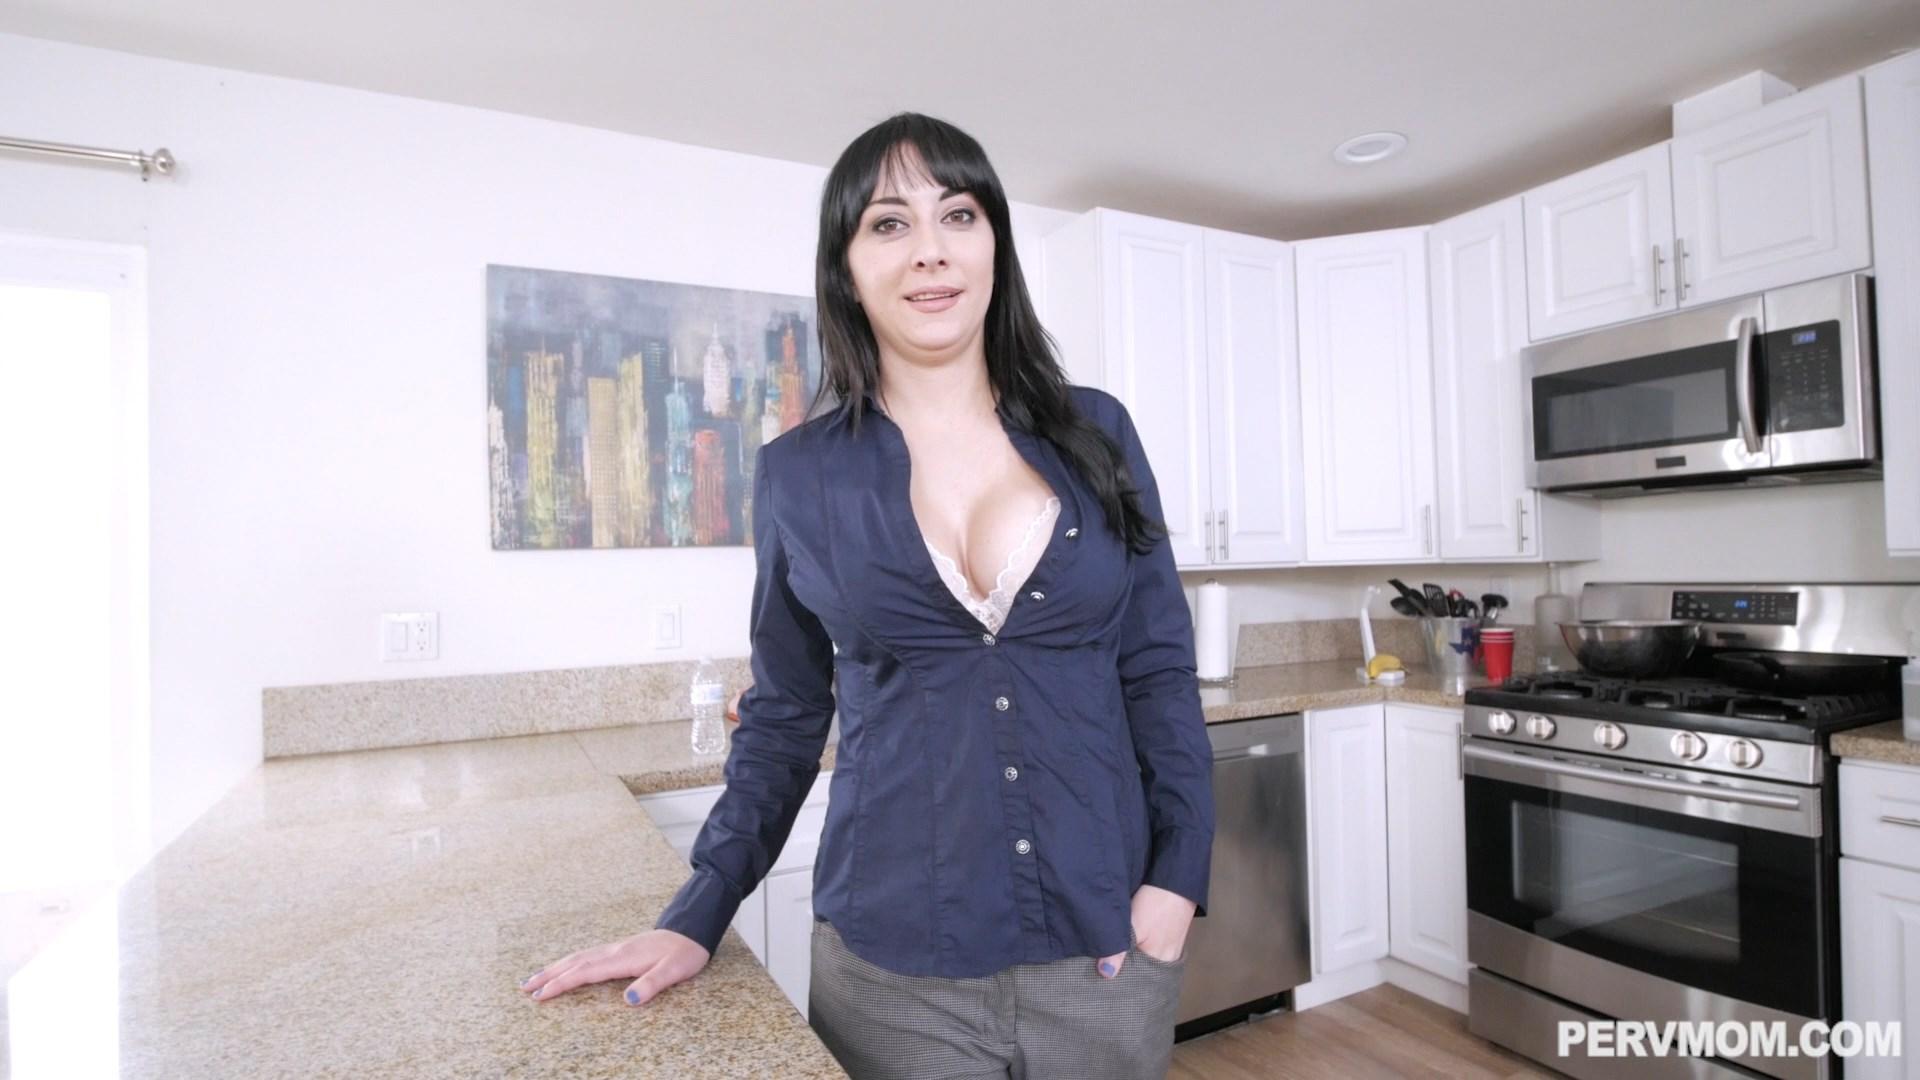 Perv Mom - Stepmom Is Working On My Dick - Alessandra Snow